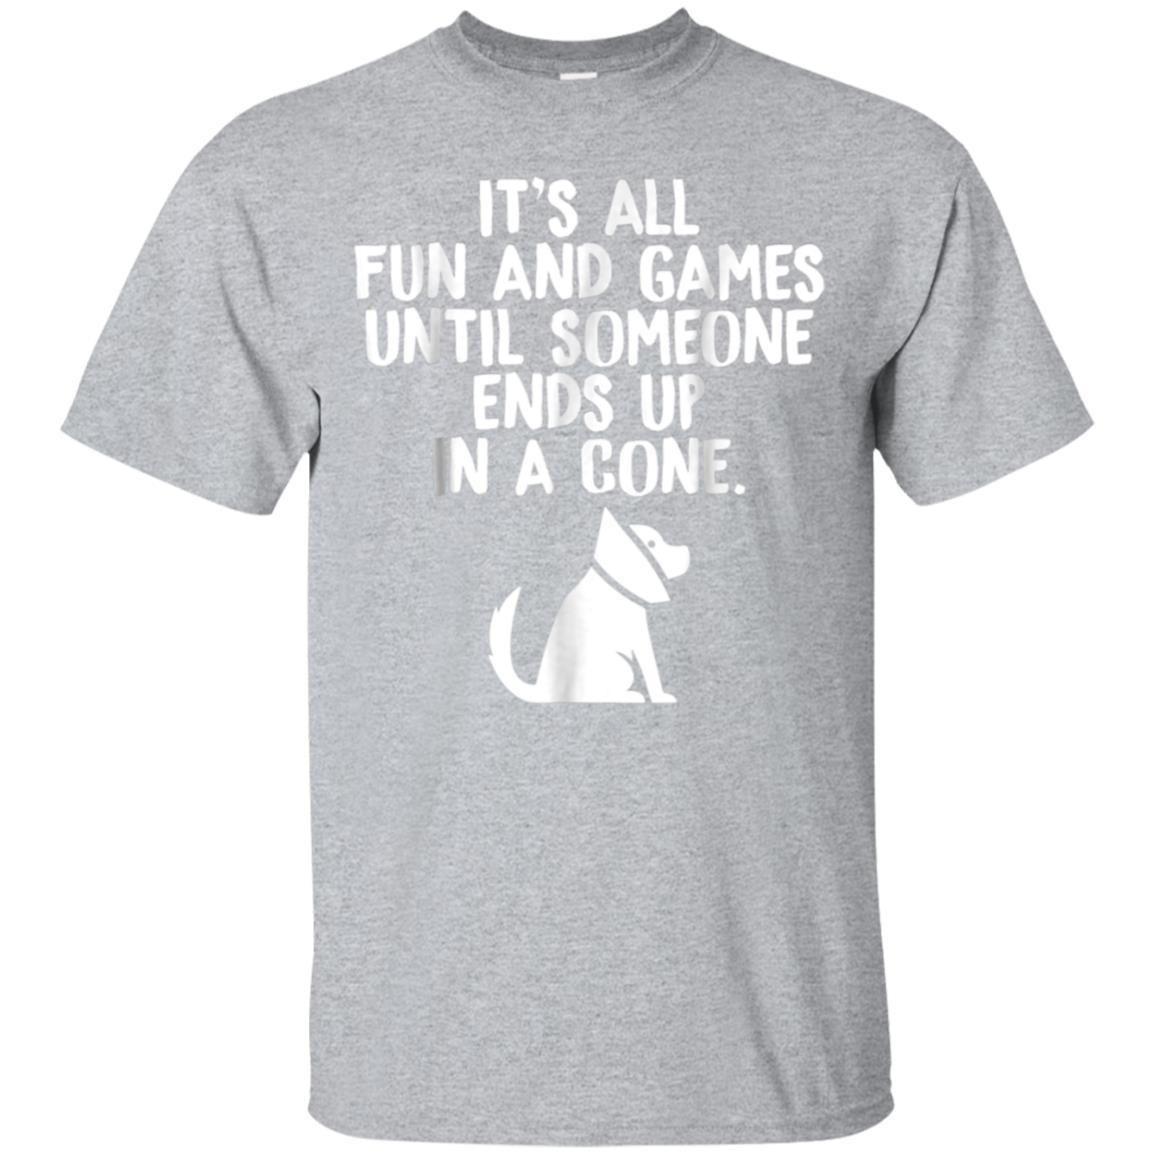 2ed268ea 99promocode Funny Veterinarian Vet Tech Gift Shirt Veterinary School Tee